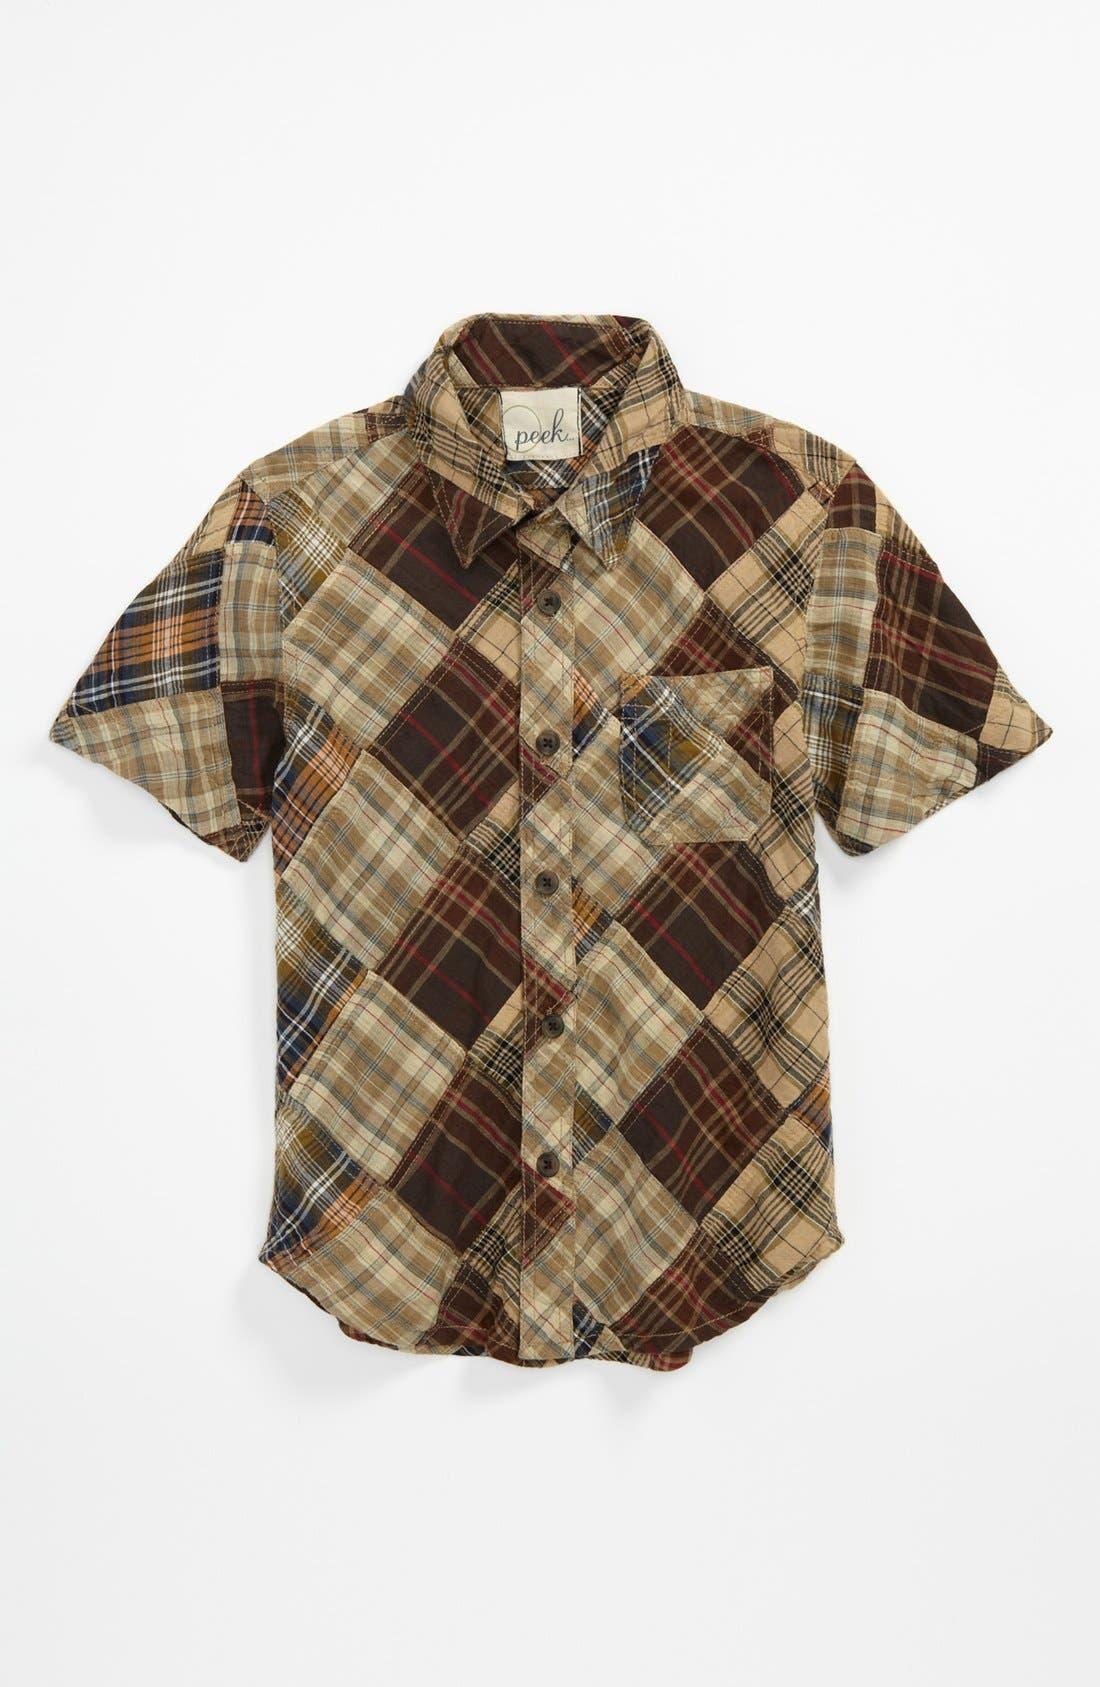 Alternate Image 1 Selected - Peek 'Grant' Plaid Shirt (Big Boys)